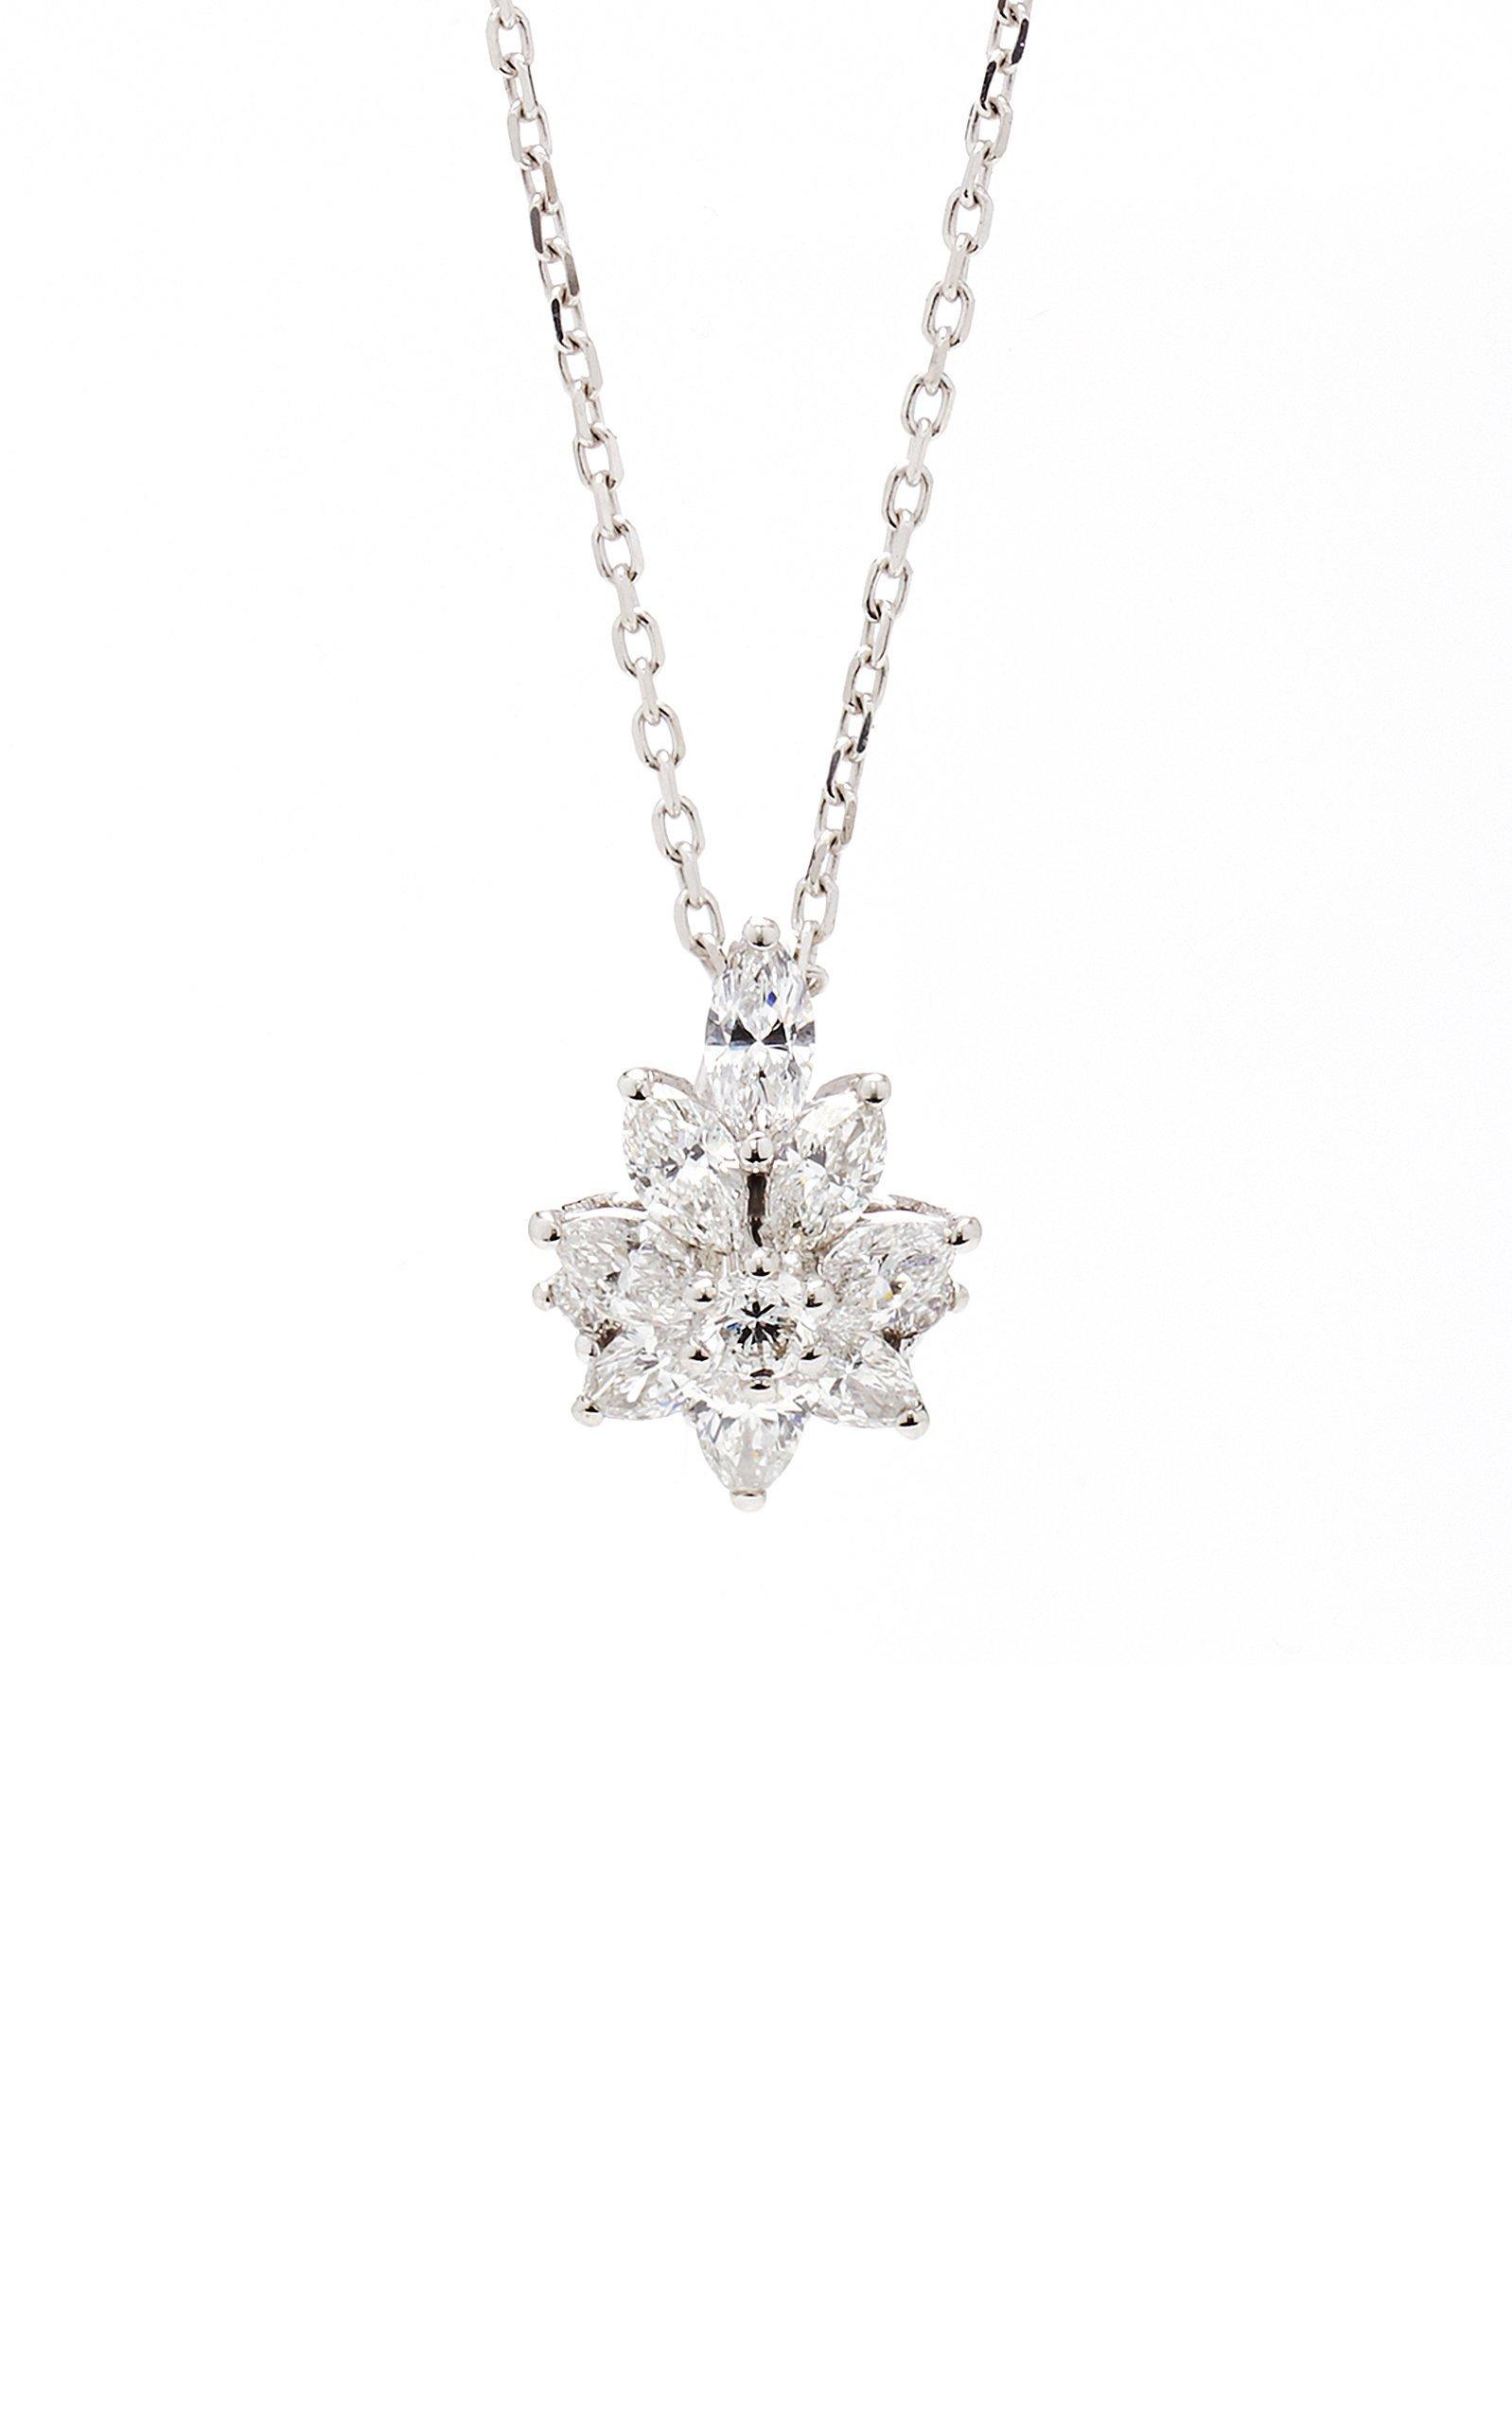 Star Pendant 18K White And Diamond Necklace by Yeprem | Moda Operandi